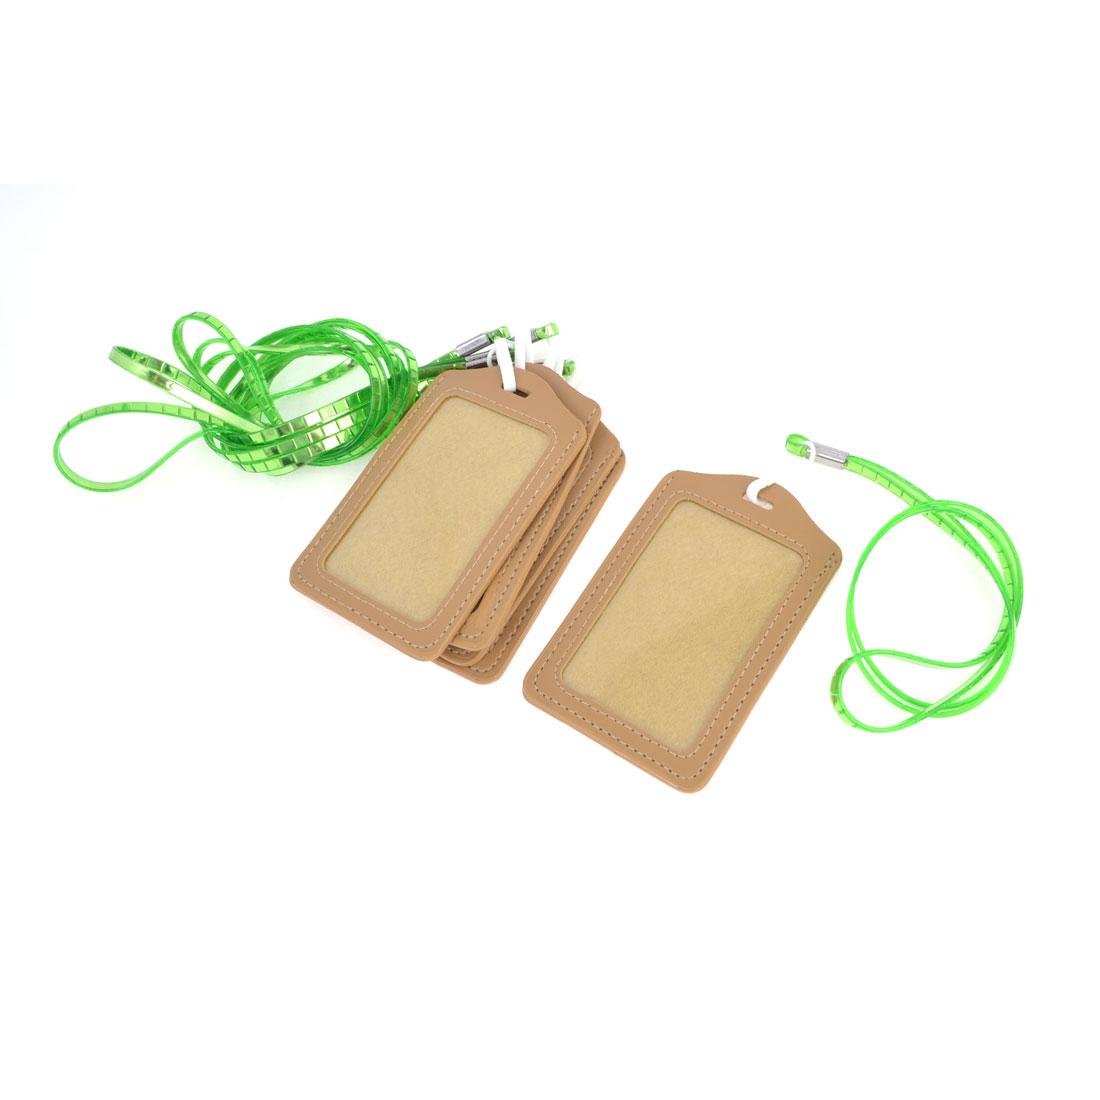 5pcs Khaki Green Vertical Name ID Card Badge Holder Protector Neck Strap Lanyard